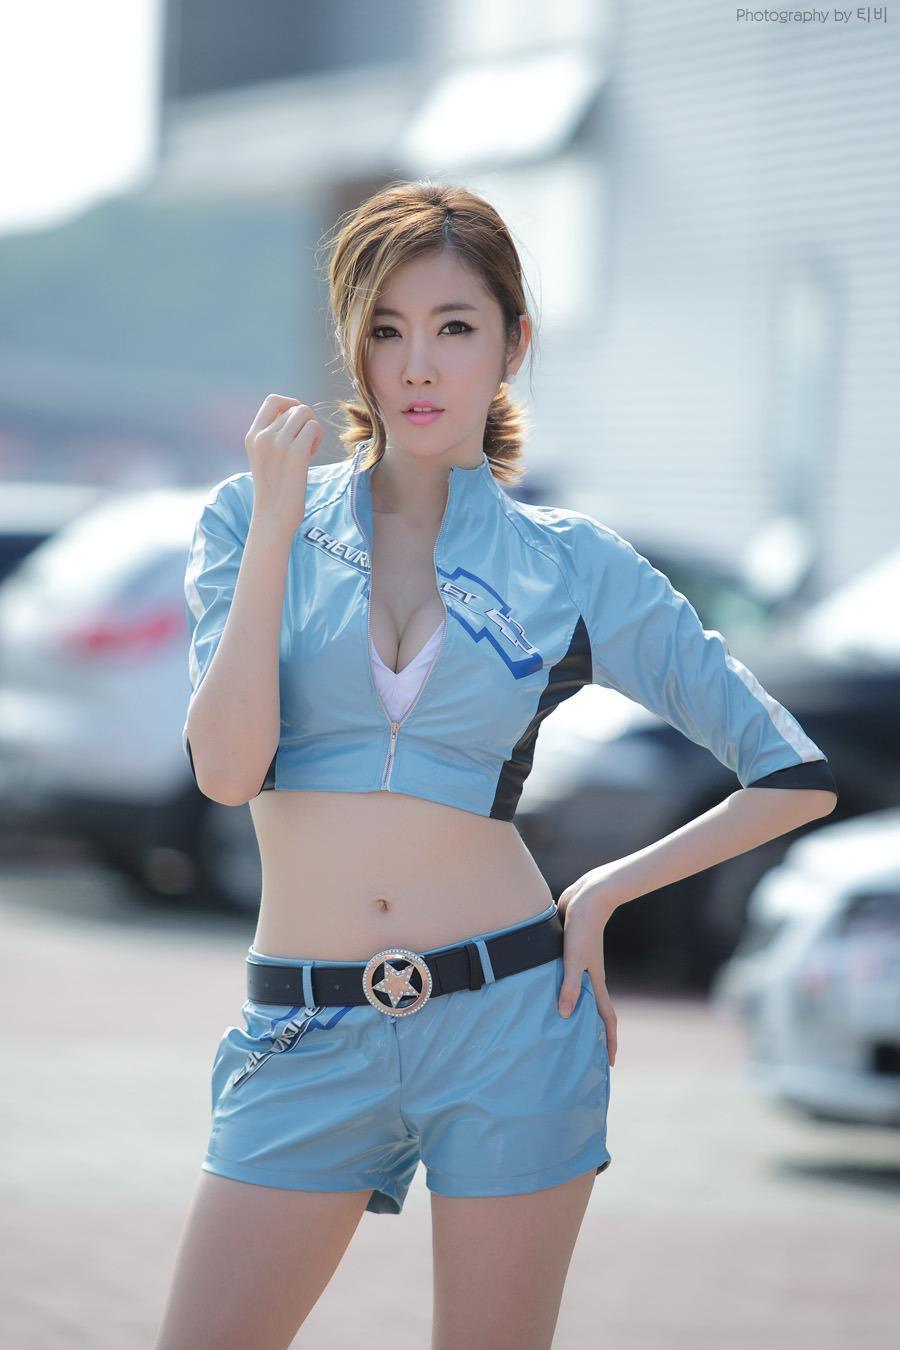 xxx nude girls: Choi Byeol Yee - CJ SuperRace 2012 R1